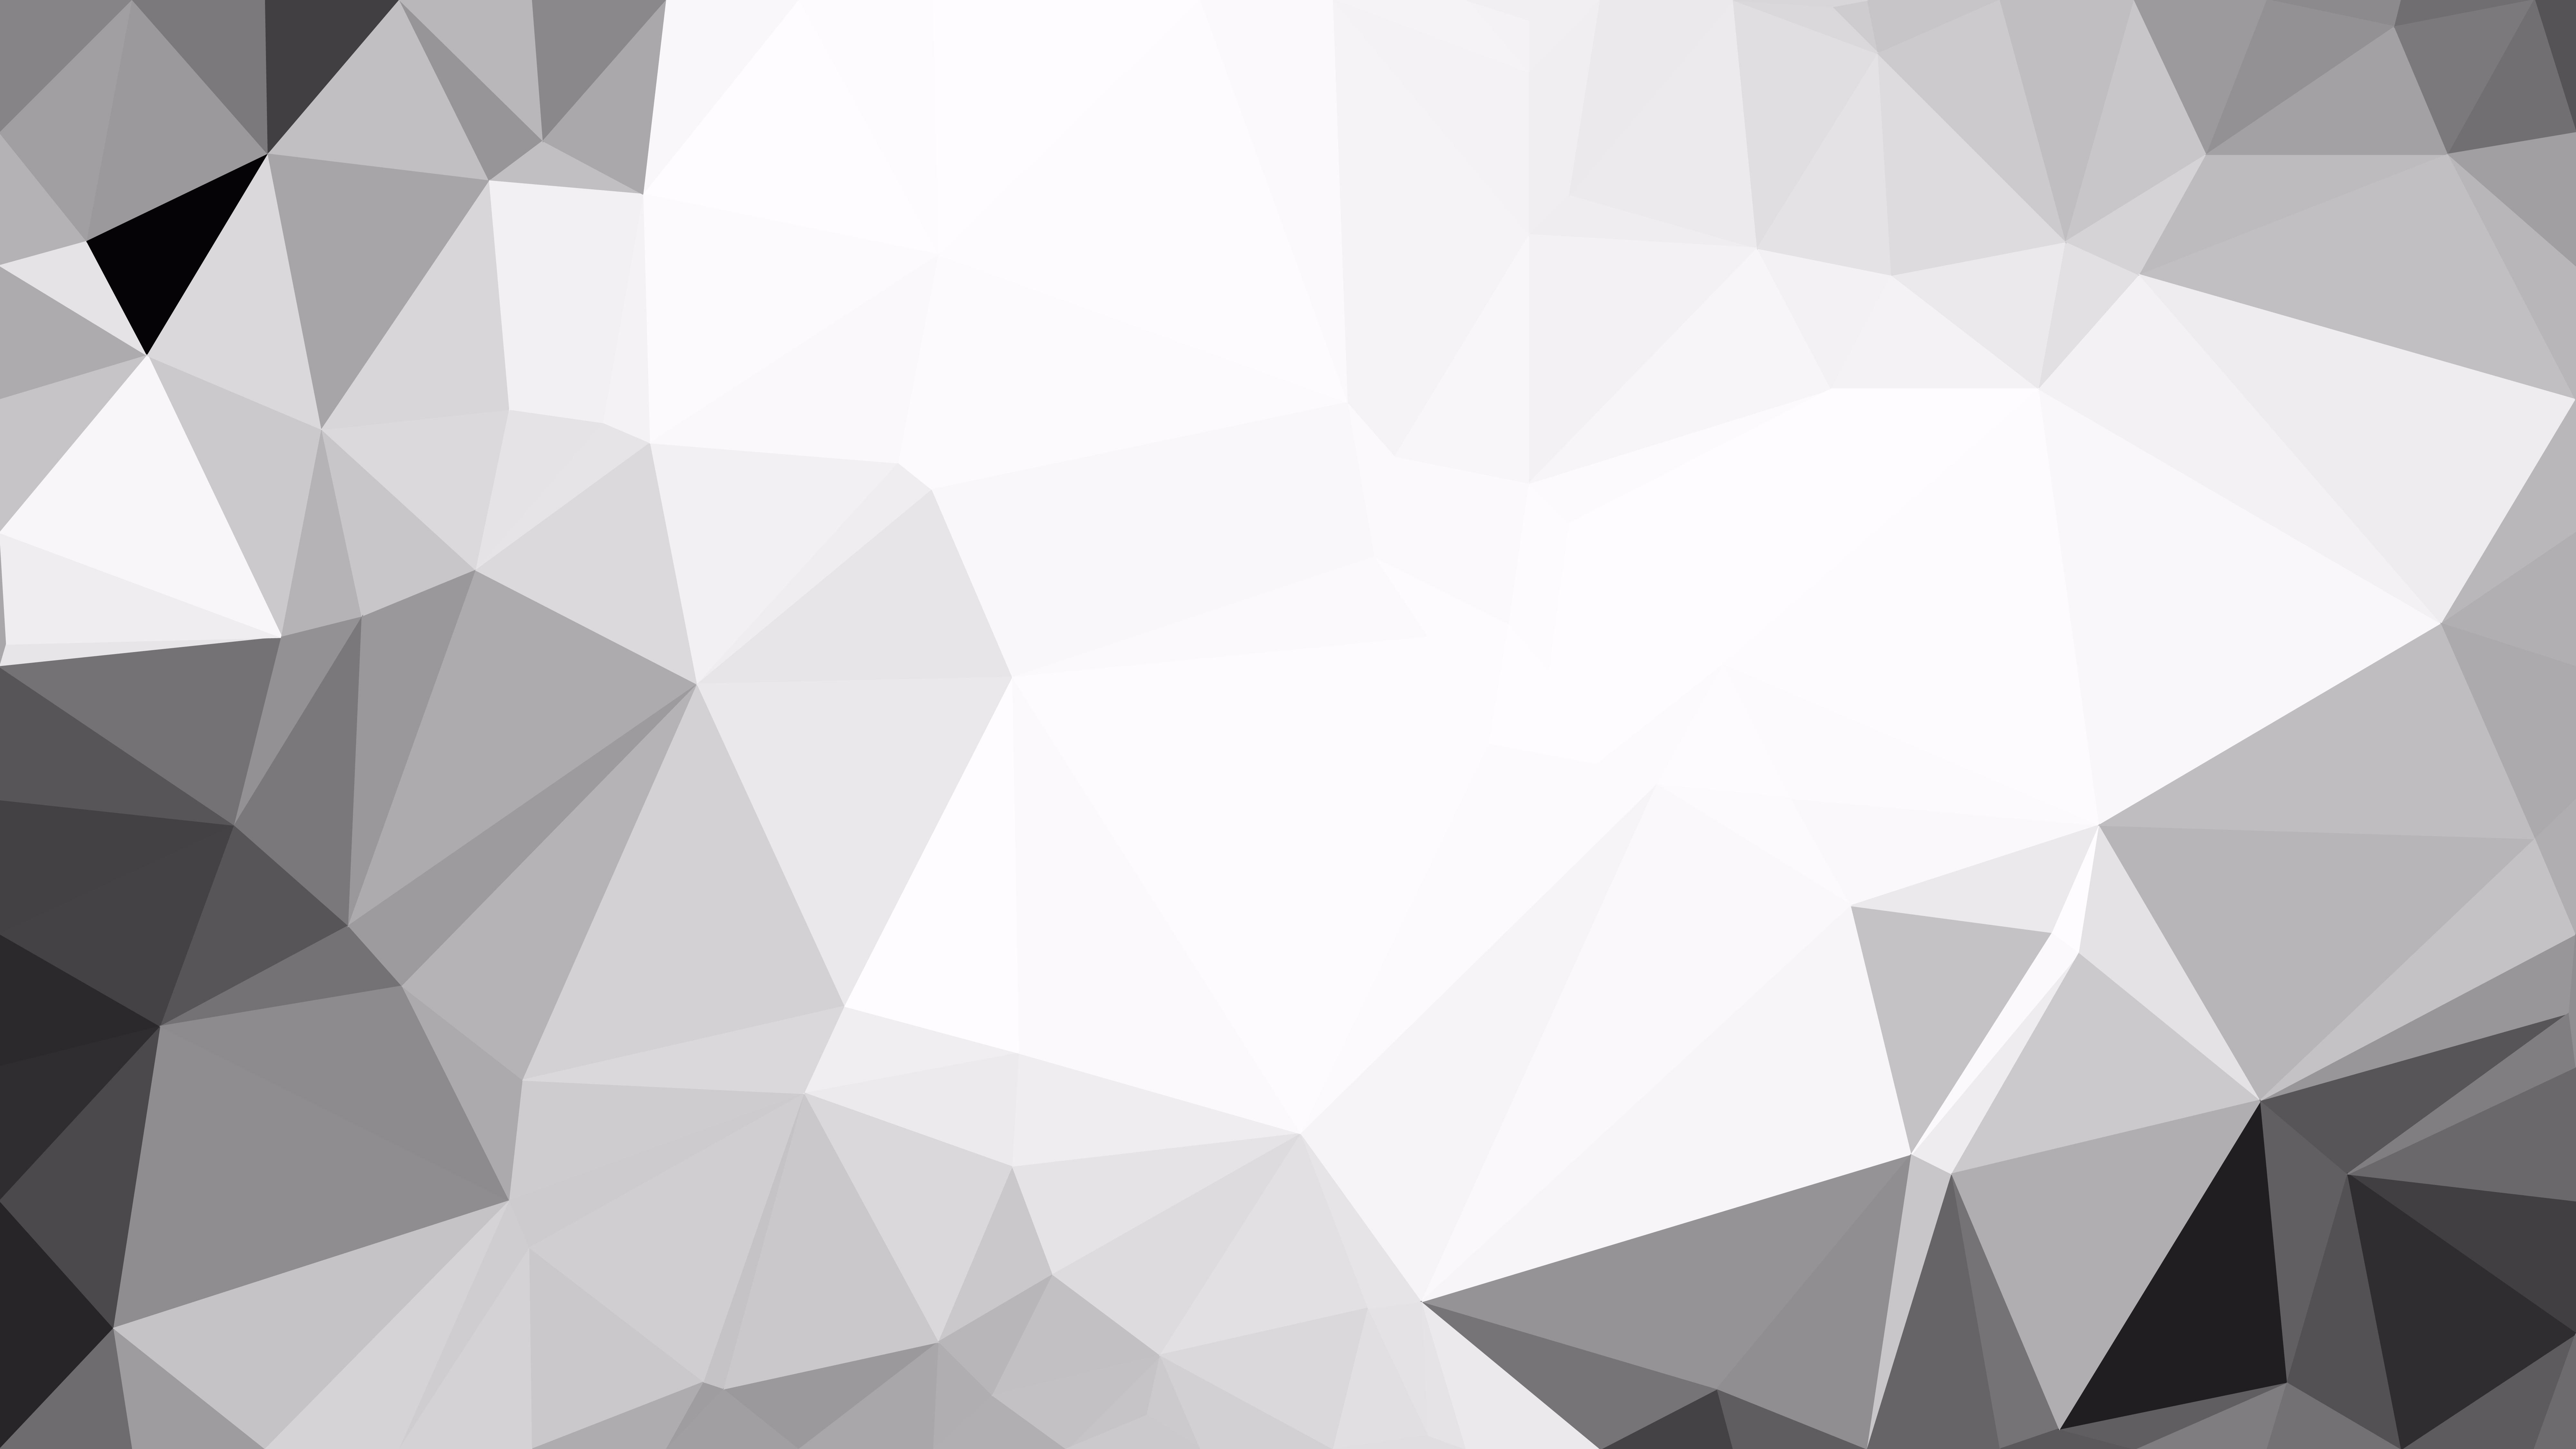 White Design Background Wpawpartco